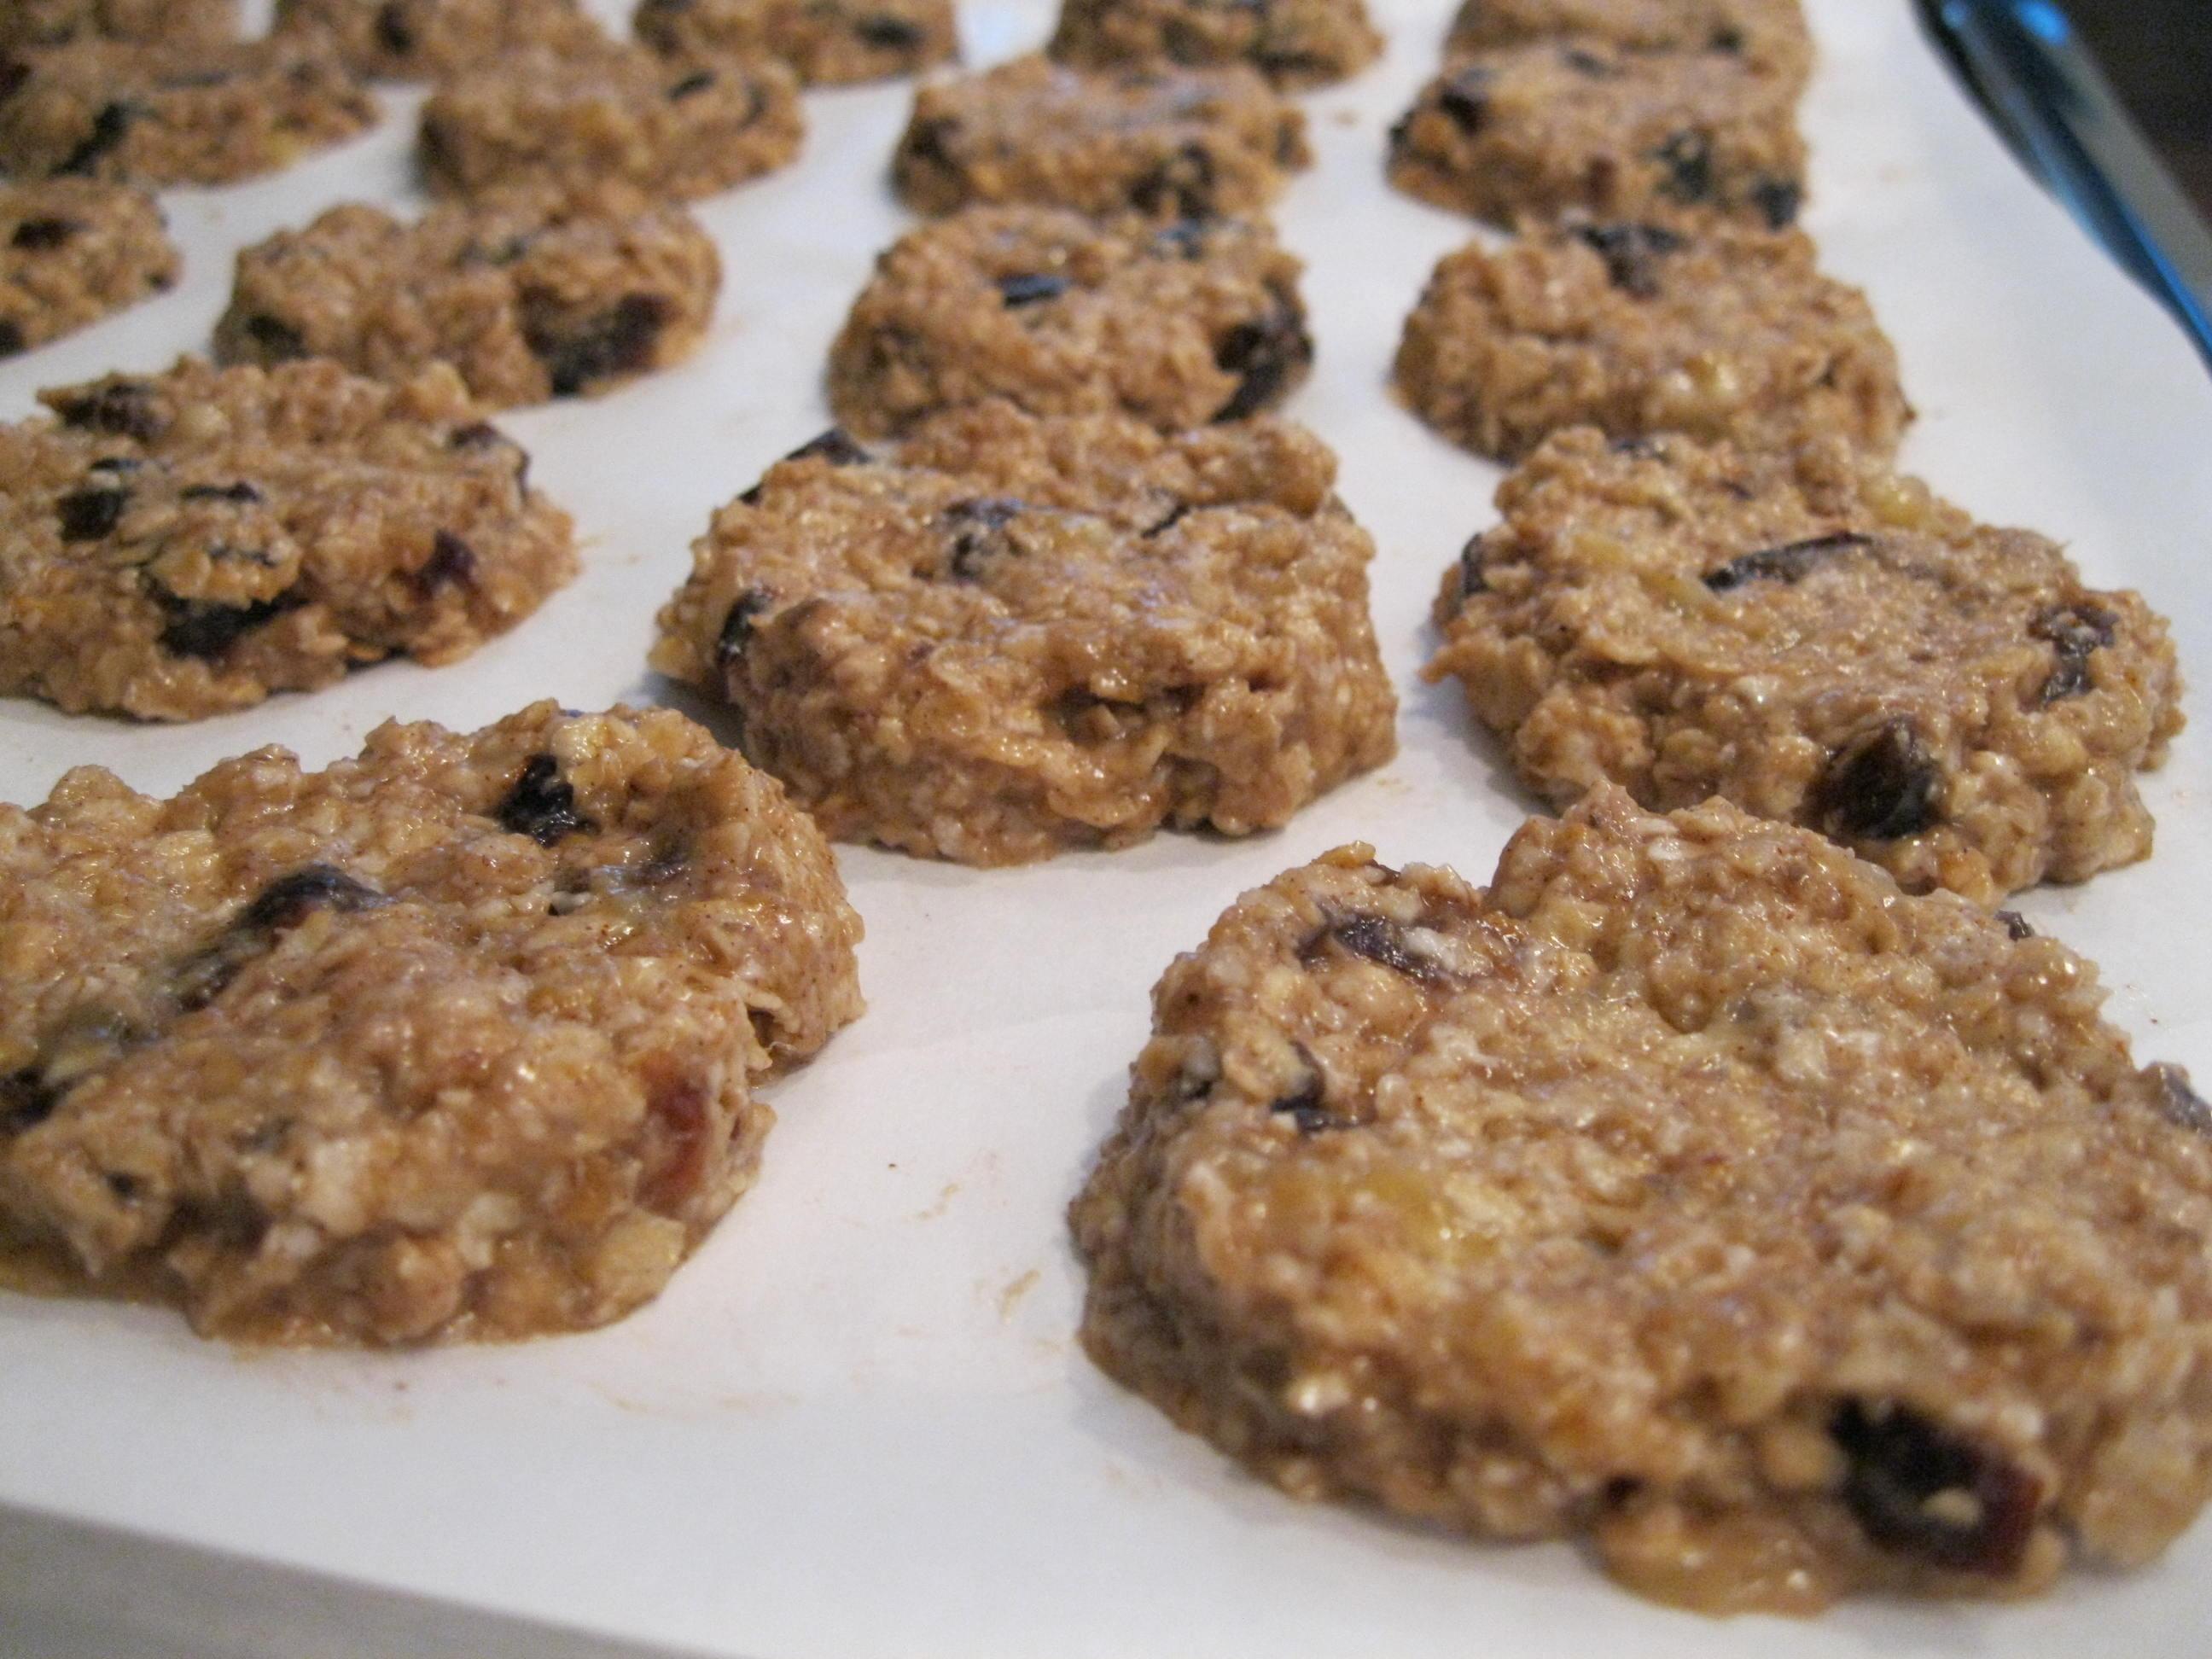 Healthy No Bake Banana Oatmeal Cookies  Banana Oatmeal Granola Bar Bite Cookies… Butterless